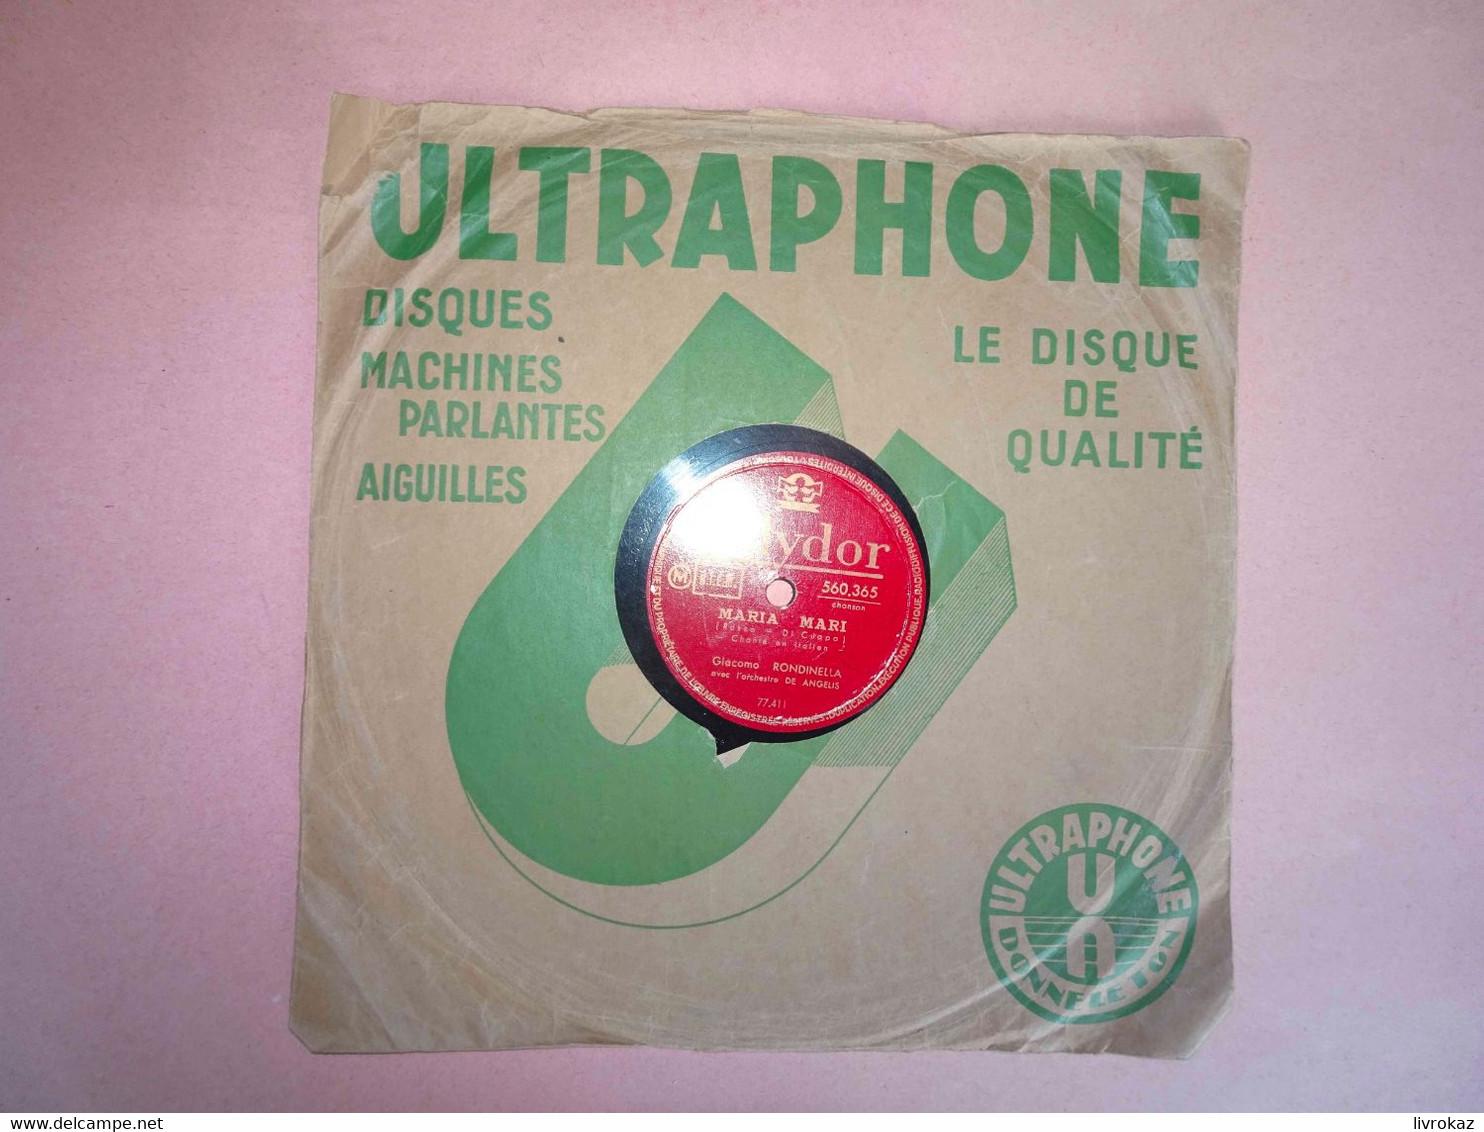 Disque 78 Tours Polydor, Chants Italiens Catari Catari, Maria Mari, G. Rondinella Et L'orchestre De Angelis, Ultraphone - 78 G - Dischi Per Fonografi